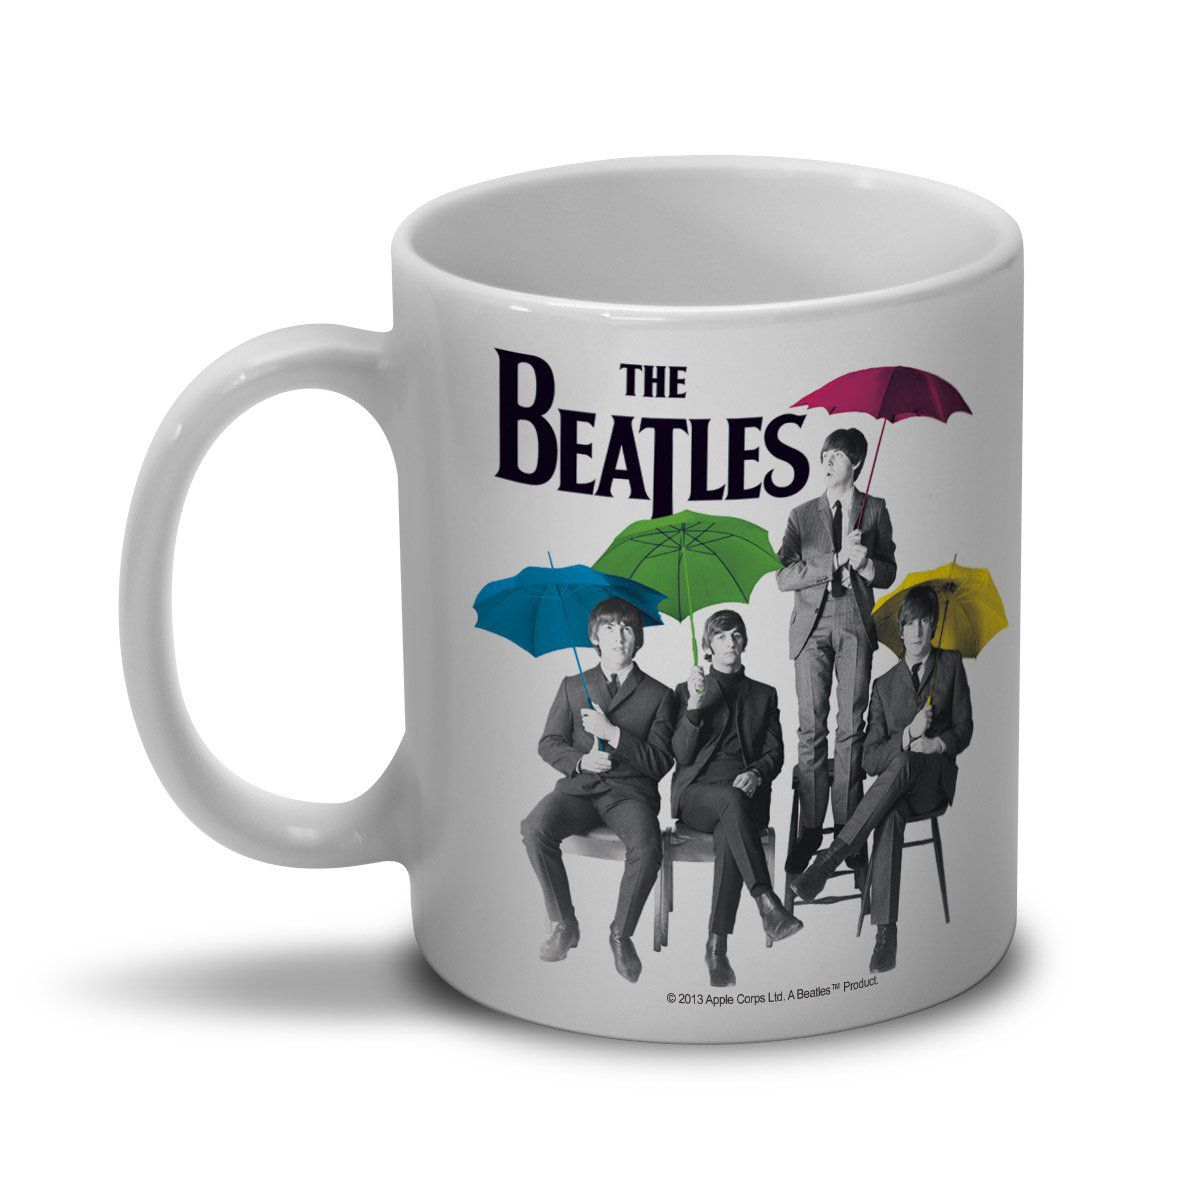 Caneca The Beatles Umbrella Colors  - bandUP Store Marketplace